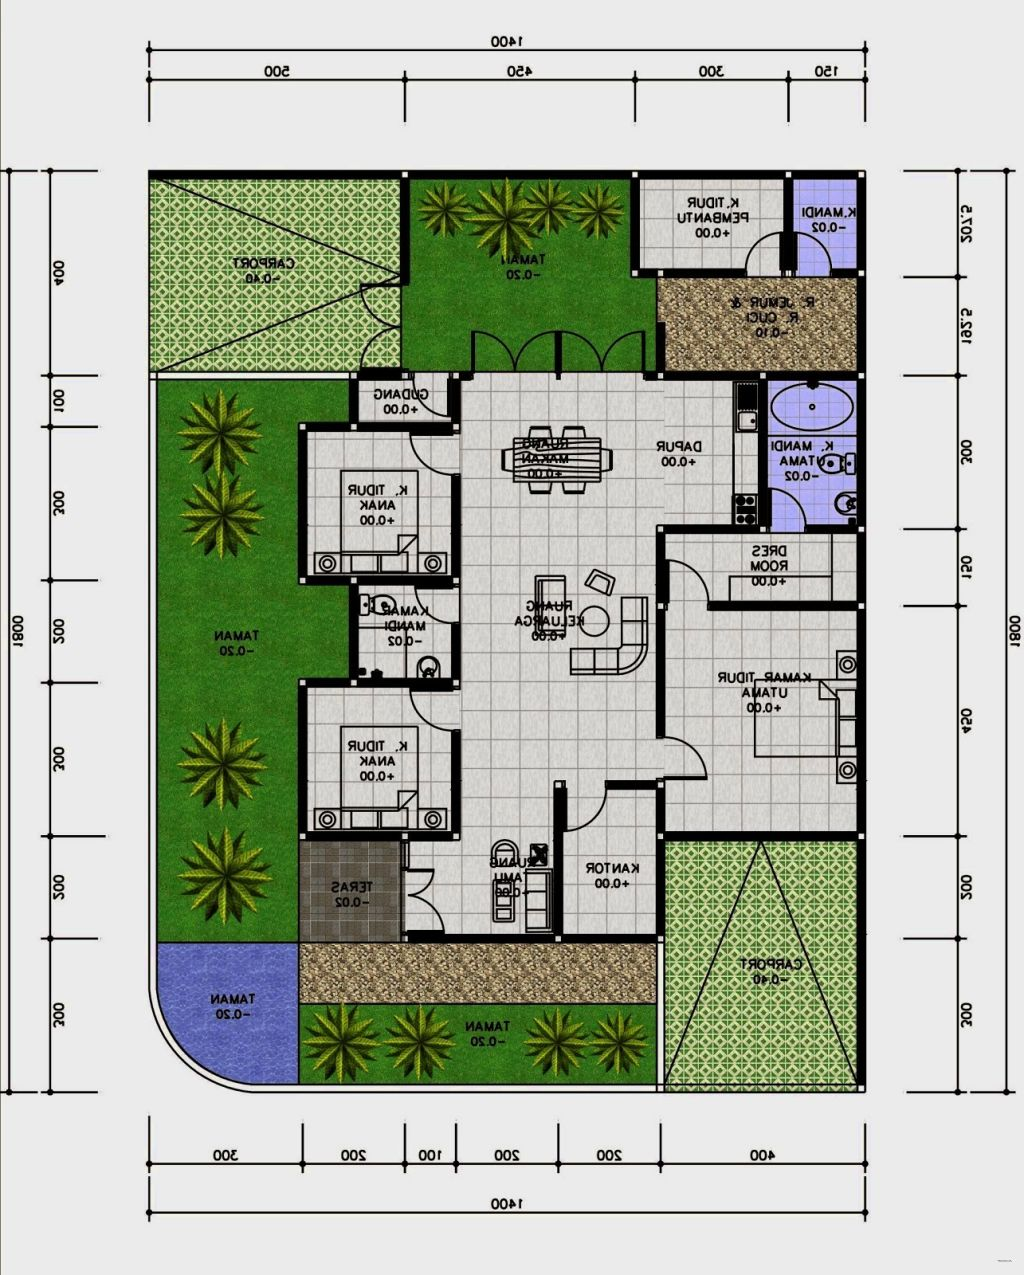 3 Contoh Denah Rumah Minimalis Modern Terbaru: Contoh Denah Minimalis Modern Terbaru Untuk Keluarga Kecil